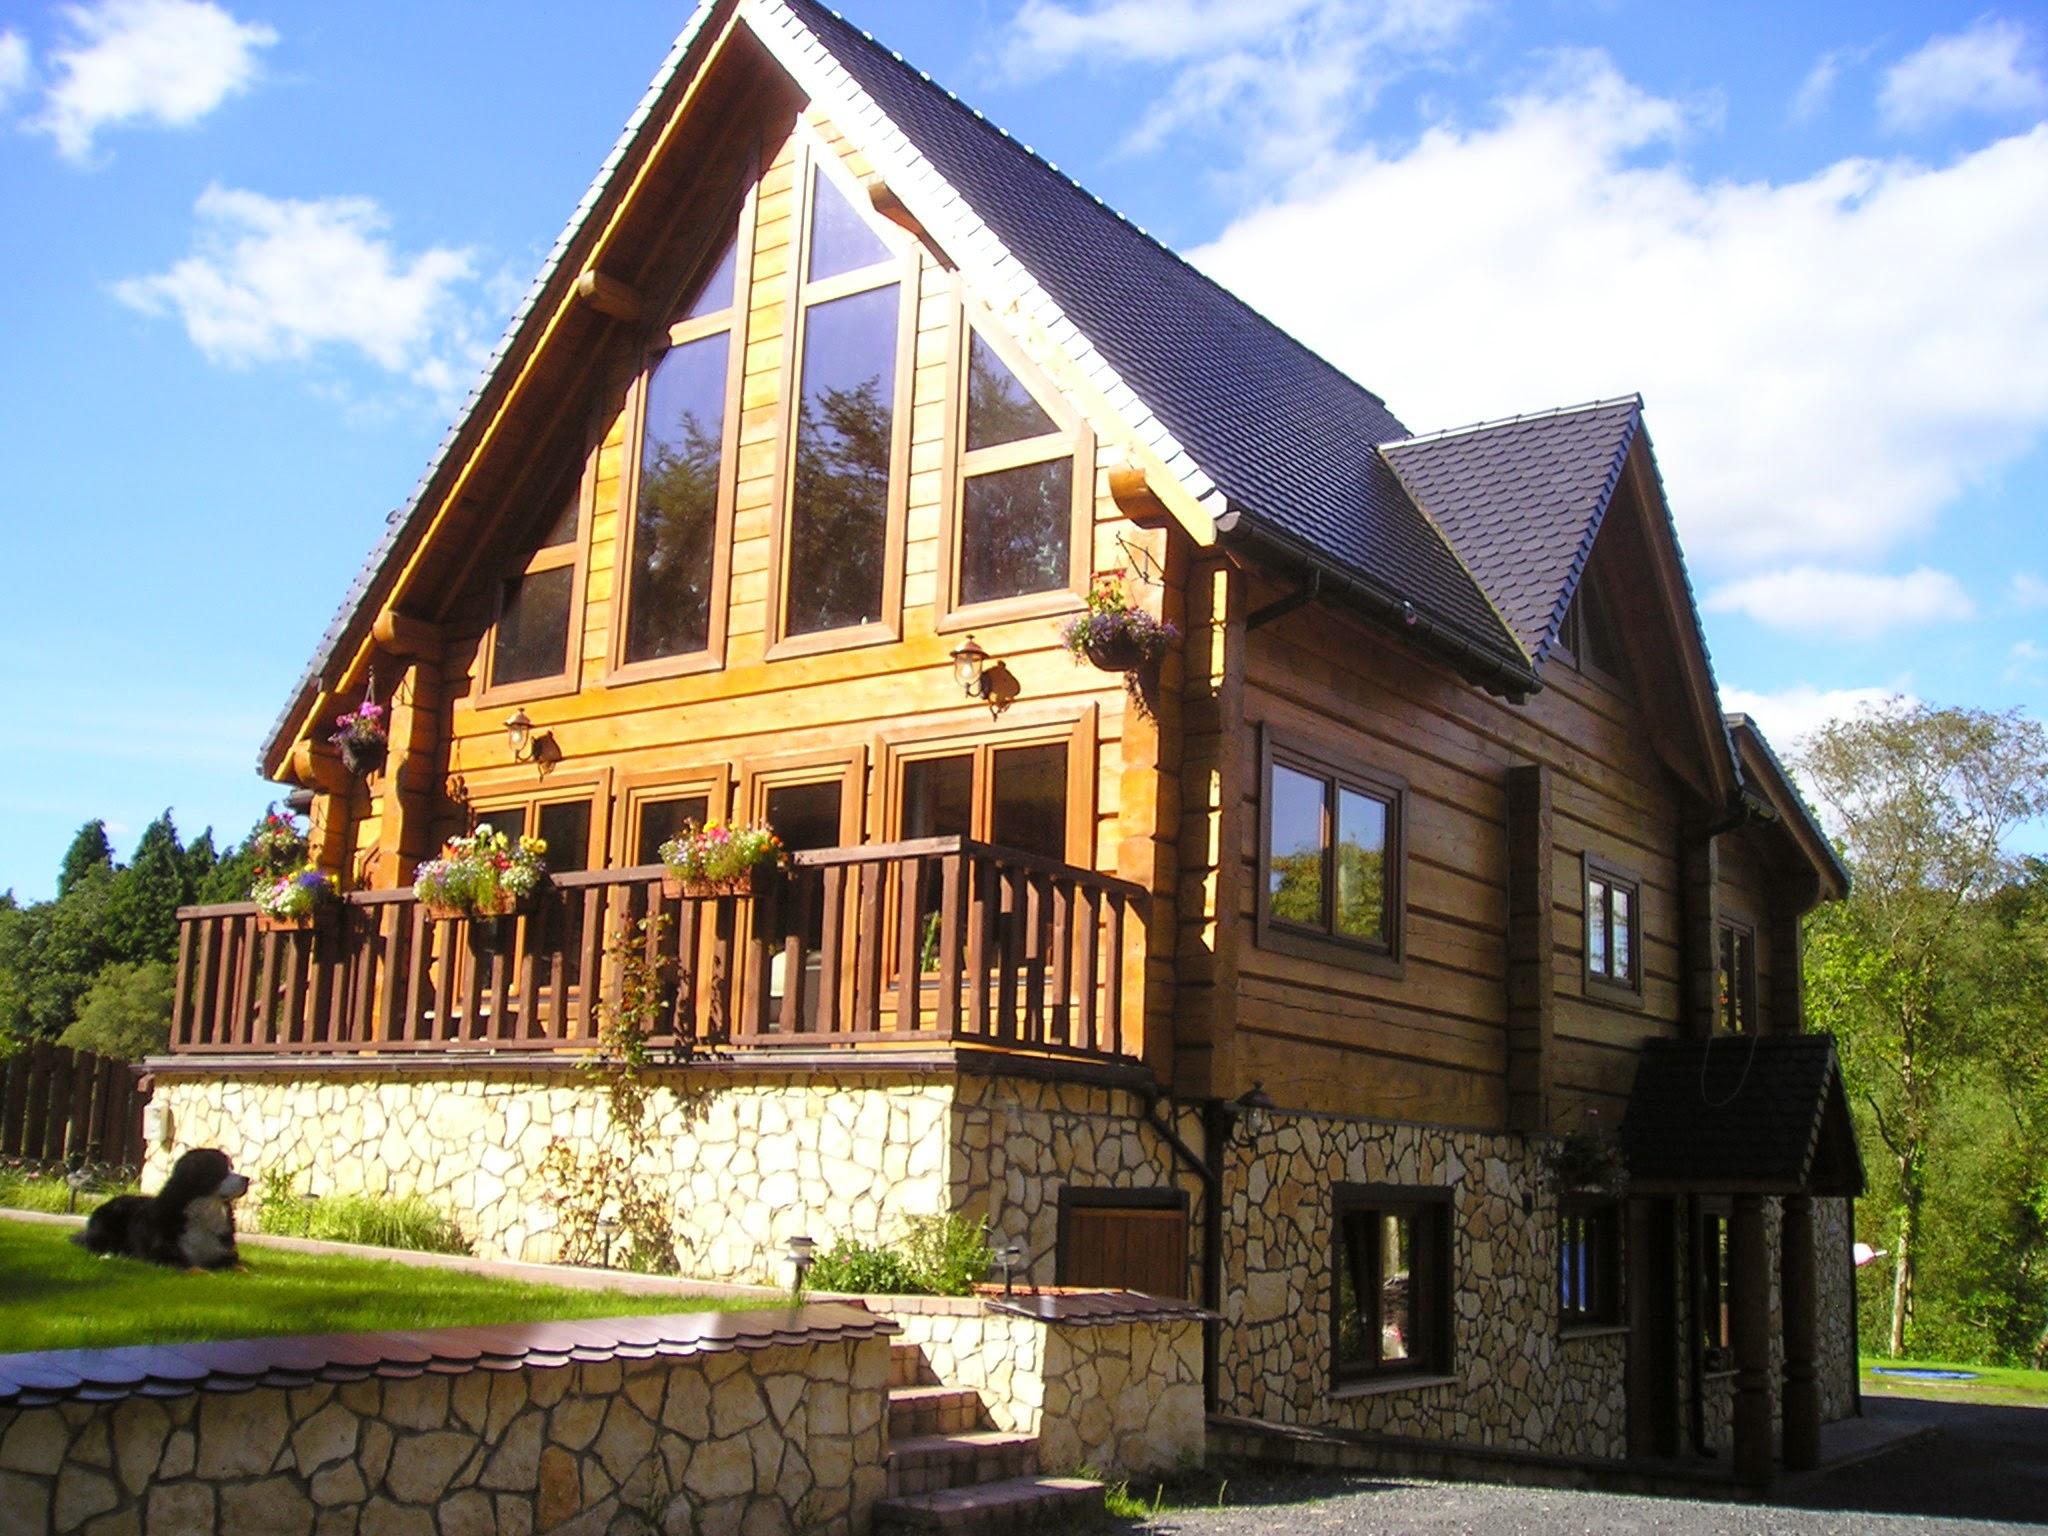 Airbnb | Kilmallock - County Limerick, Ireland - Airbnb